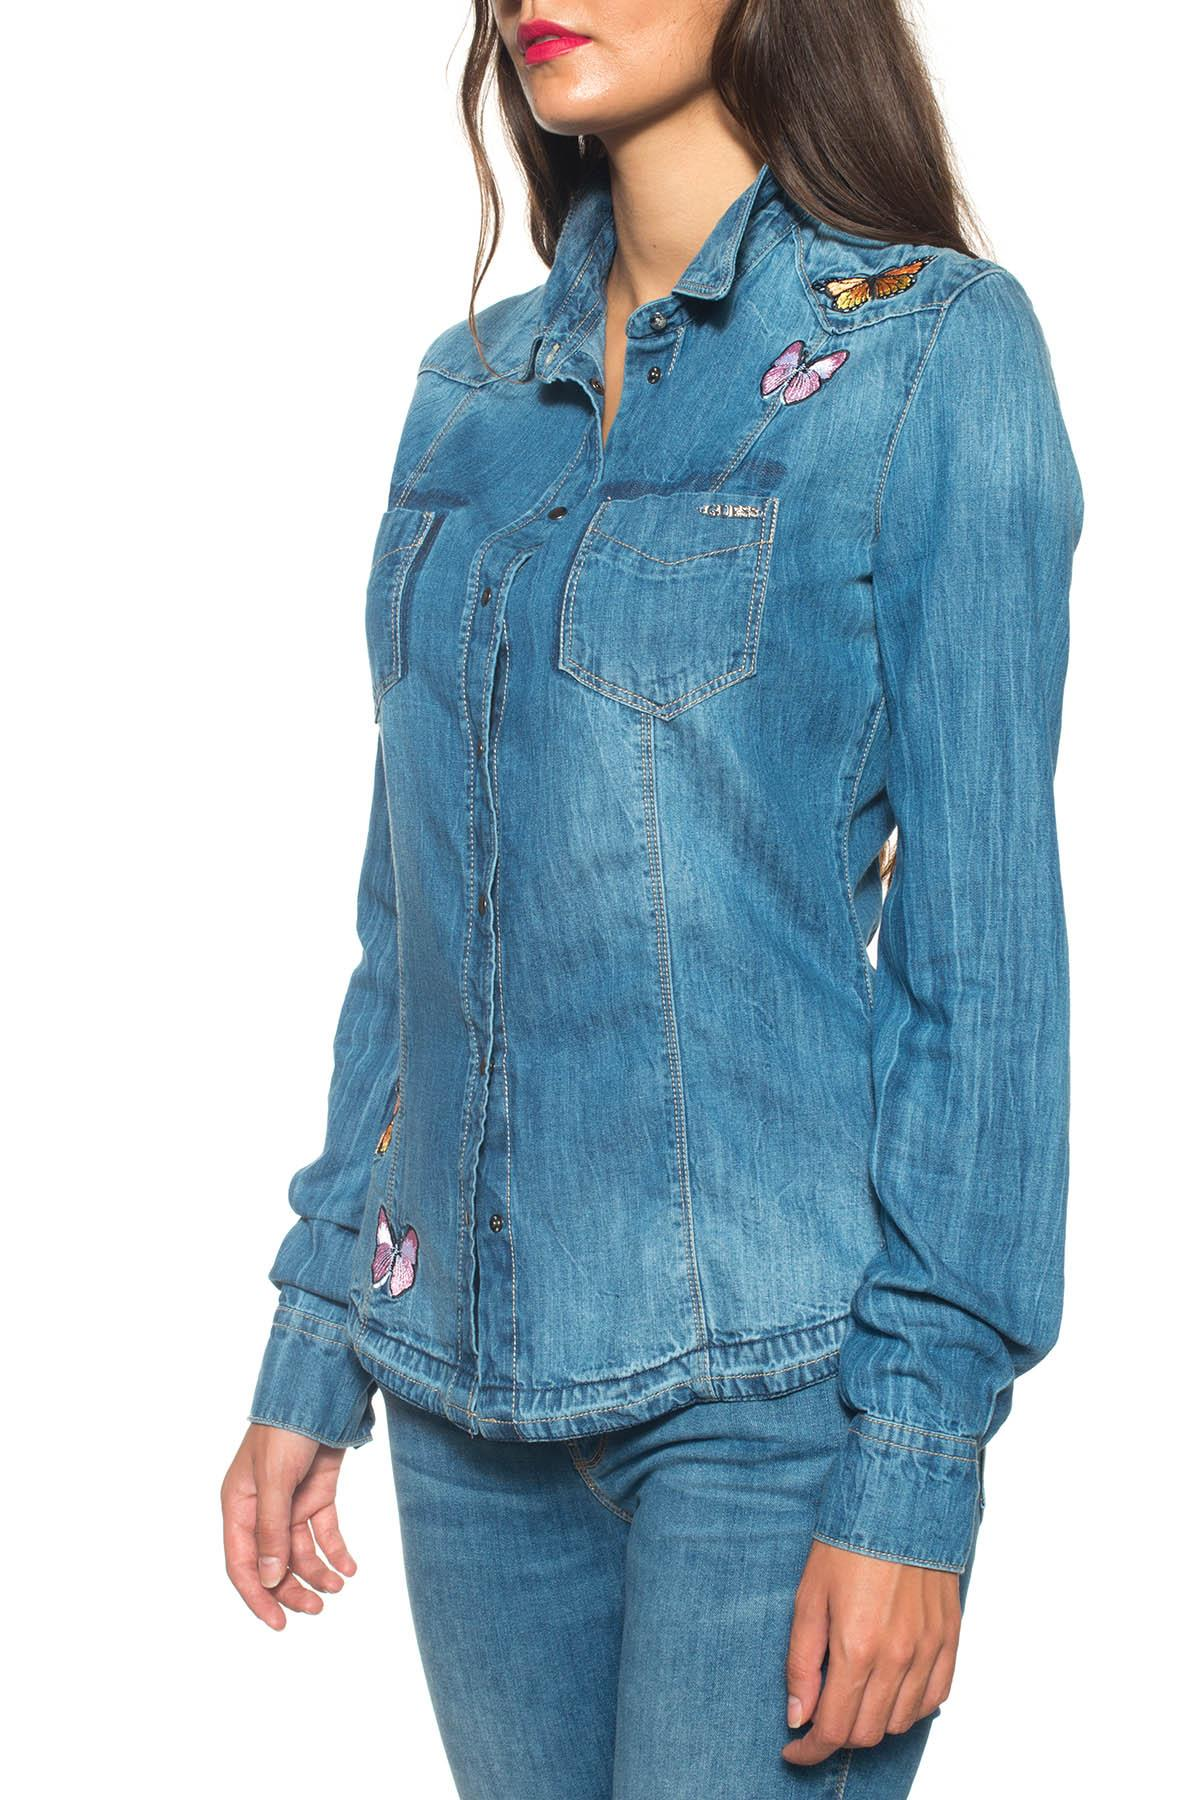 Camicia da donna in jeans